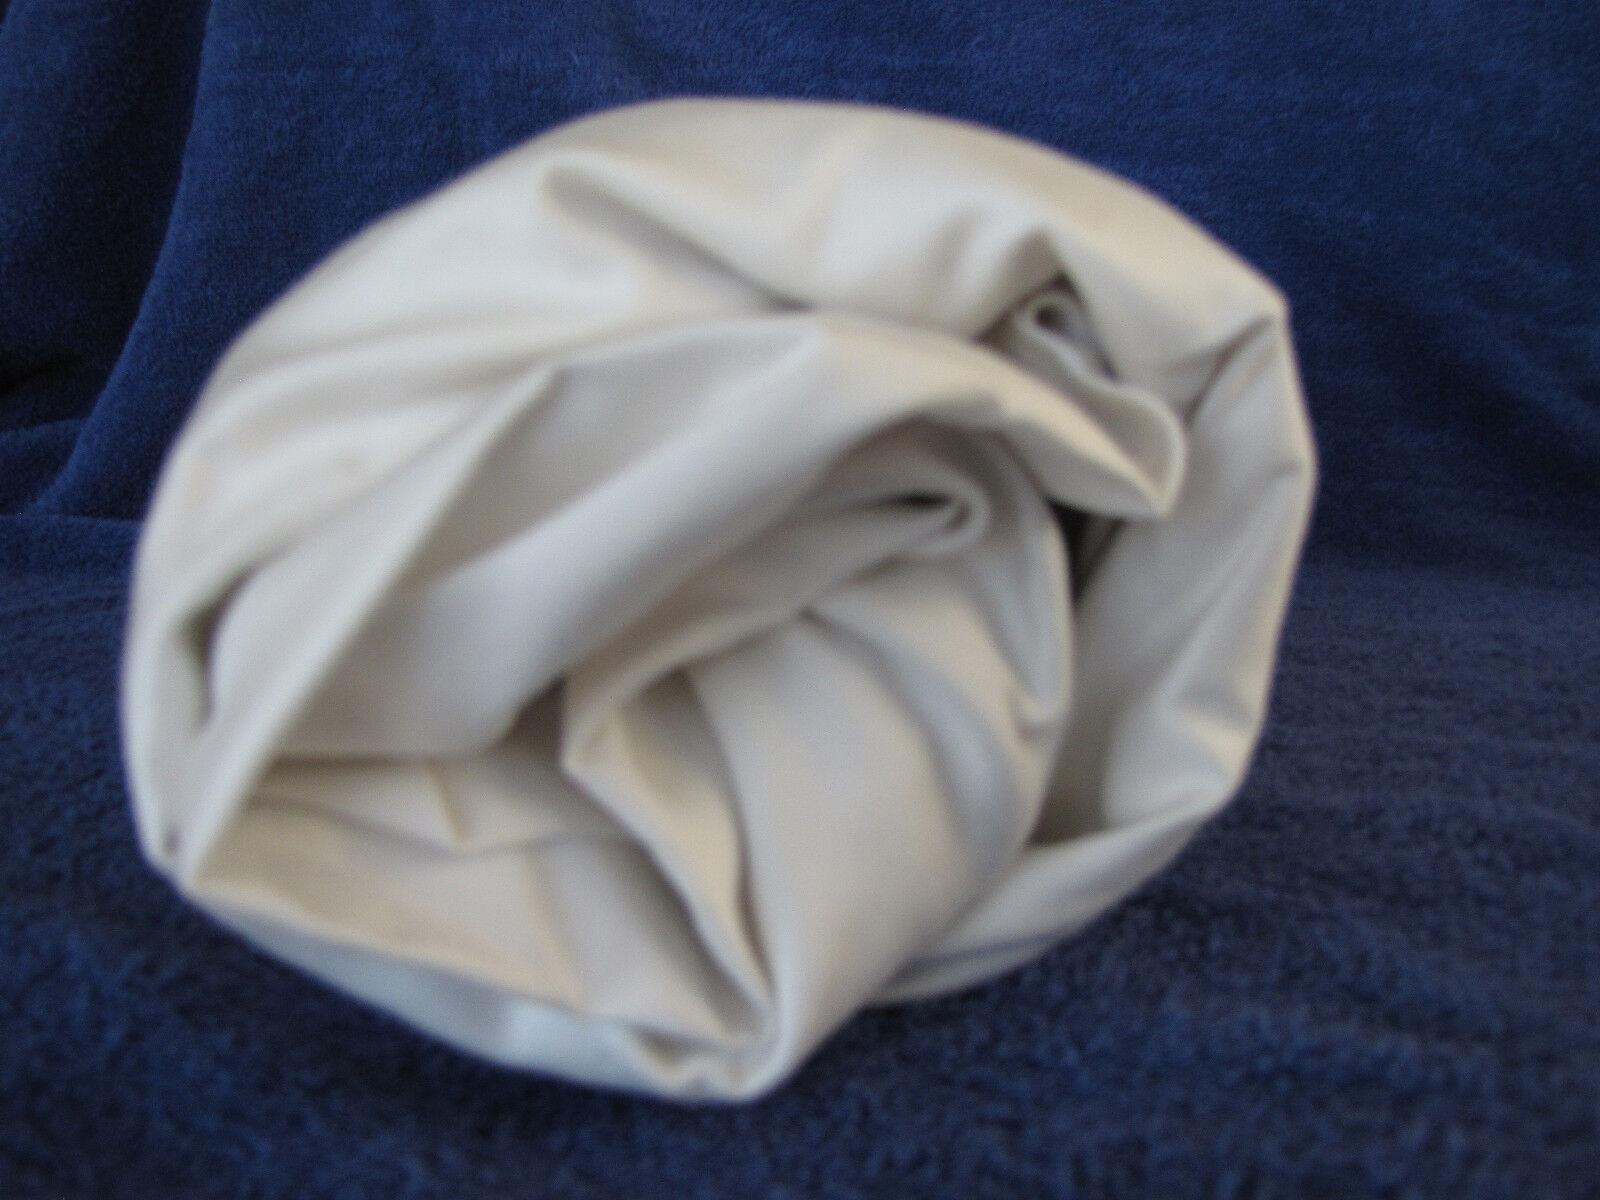 King Duvet Comforter Cover Wrinkle Free Ivory 450TC Supima Company Store 182